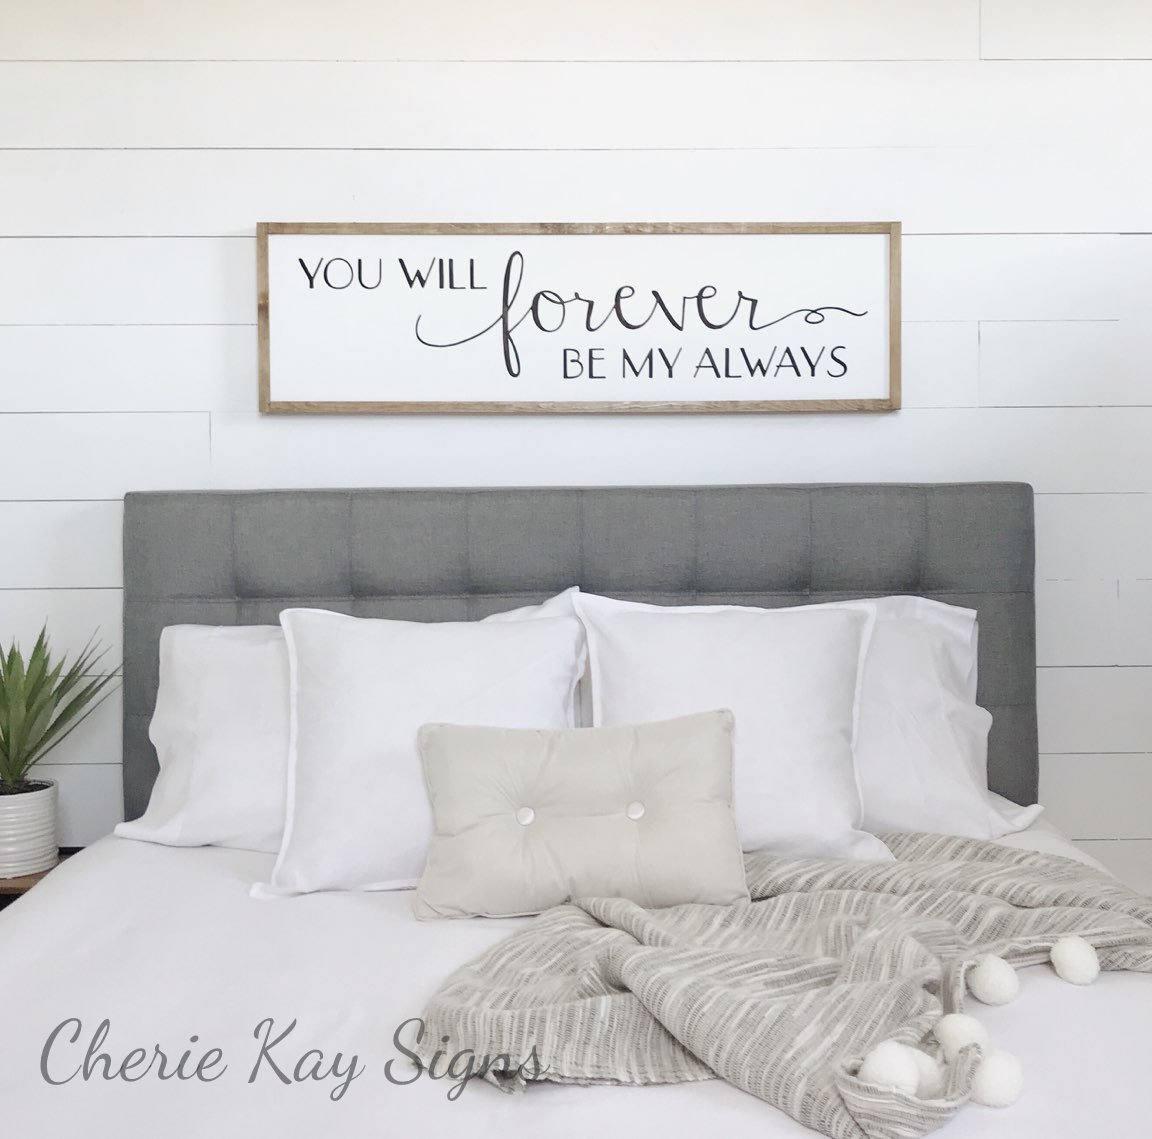 Framed sign where you go I will go bedroom wall decor